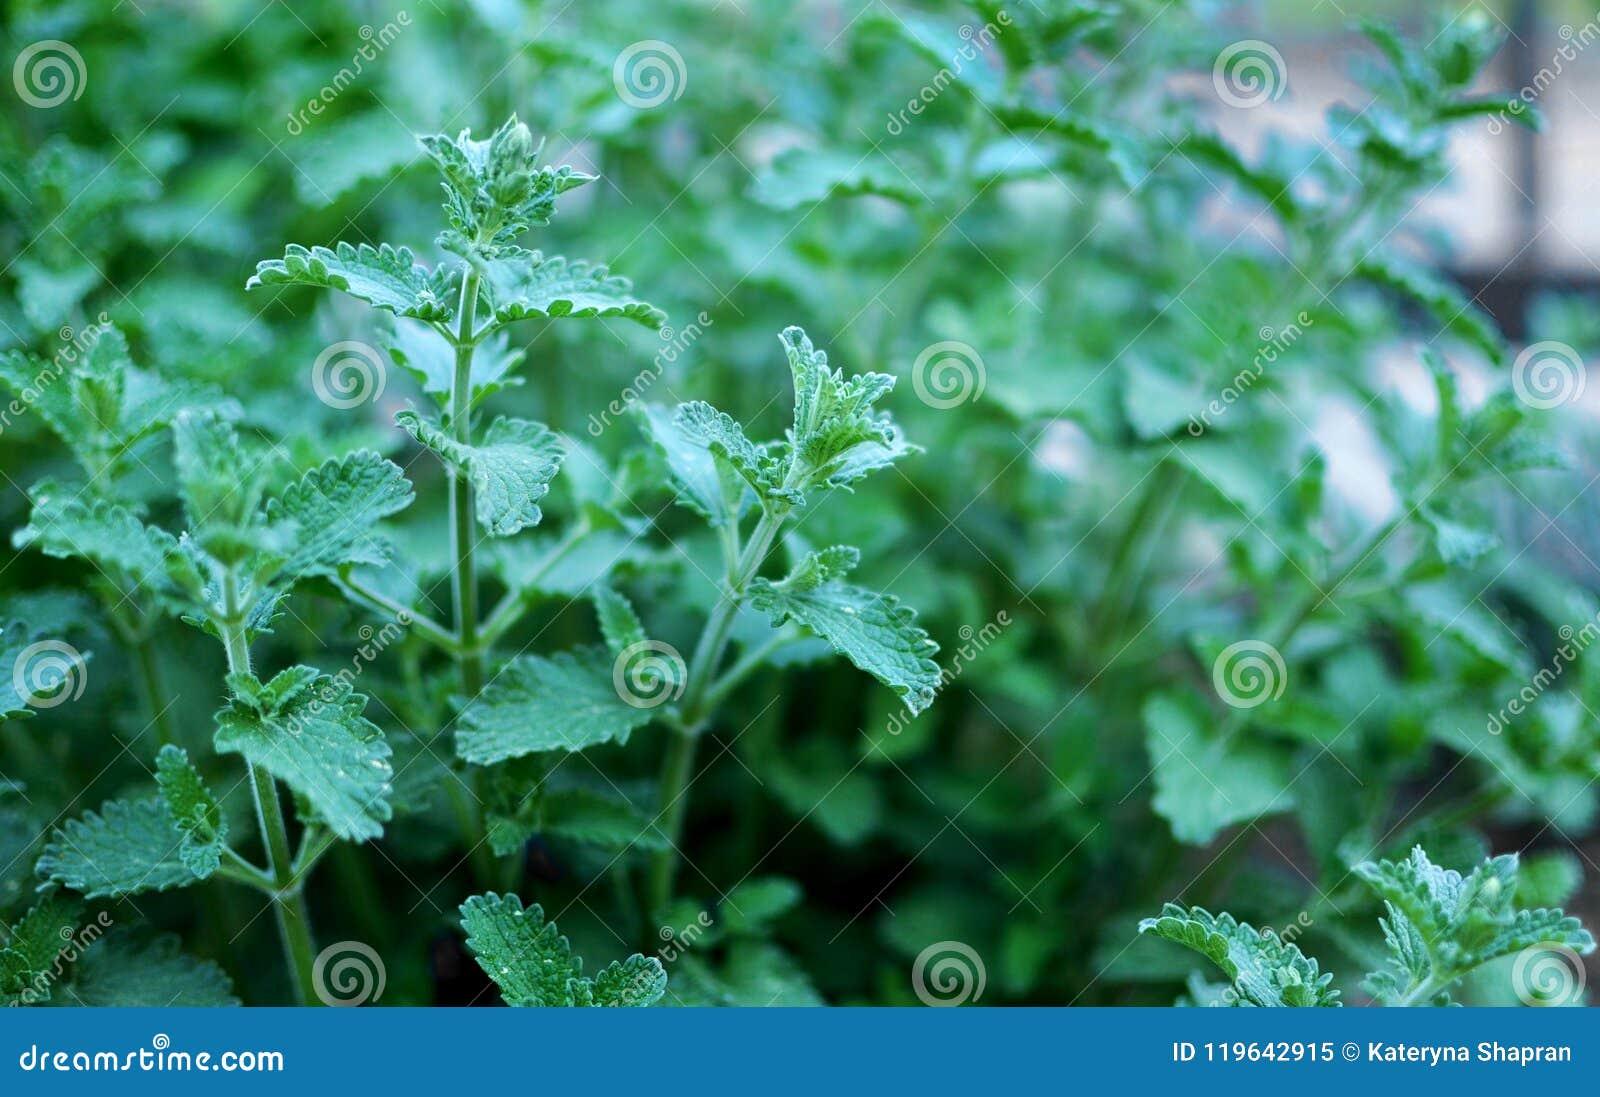 Mint Herb Growing Outdoor In A Garden, Mediterranean Herbs, Clos ...